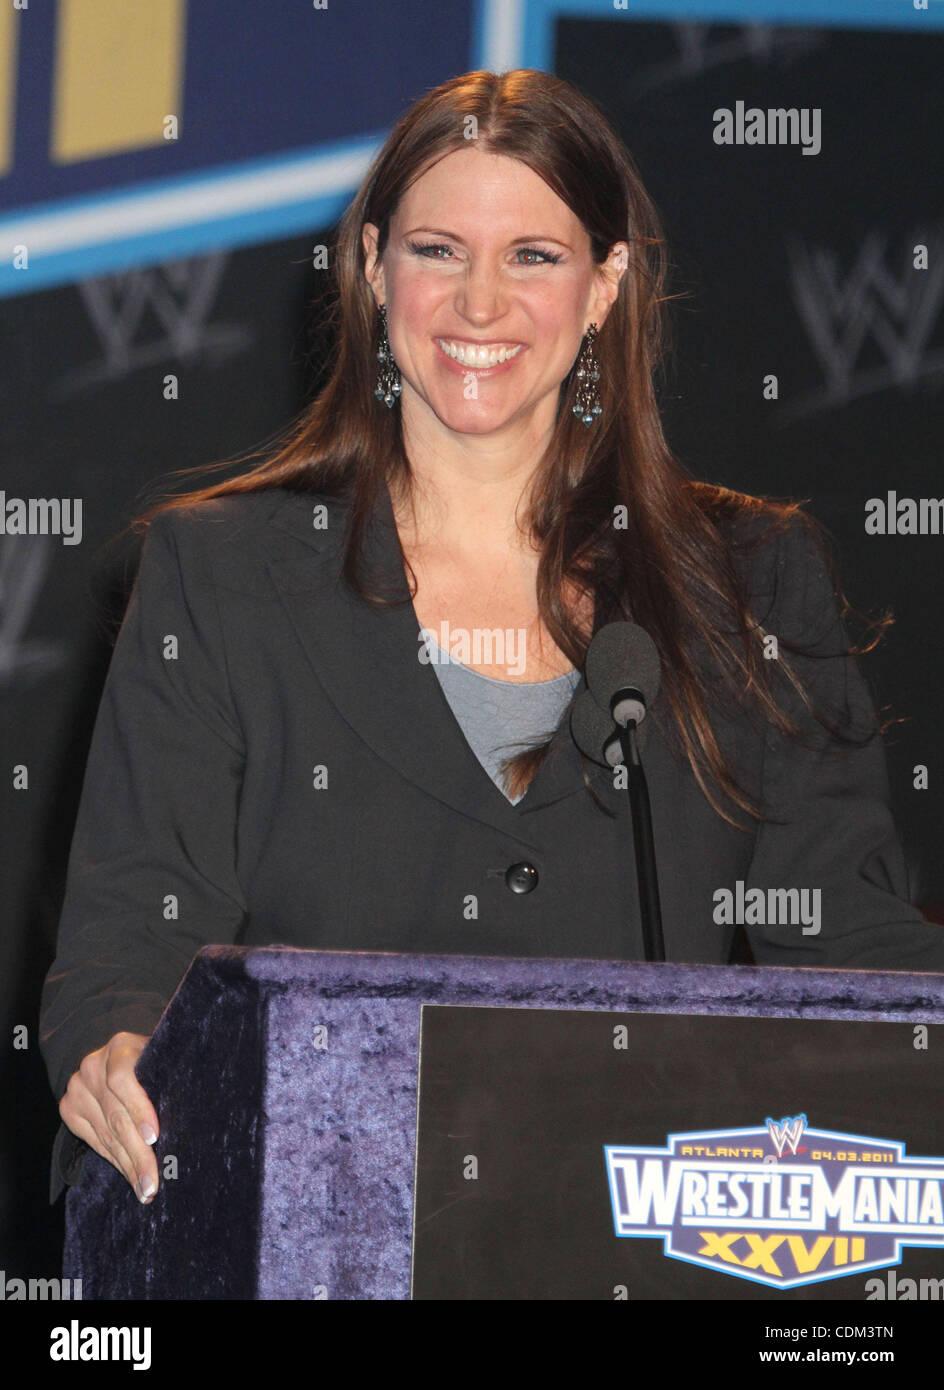 Mar. 30, 2011 - New York, New York, U.S. - STEPHANIE MCMAHON attends the WrestleMania XXVll Press Conference held - Stock Image